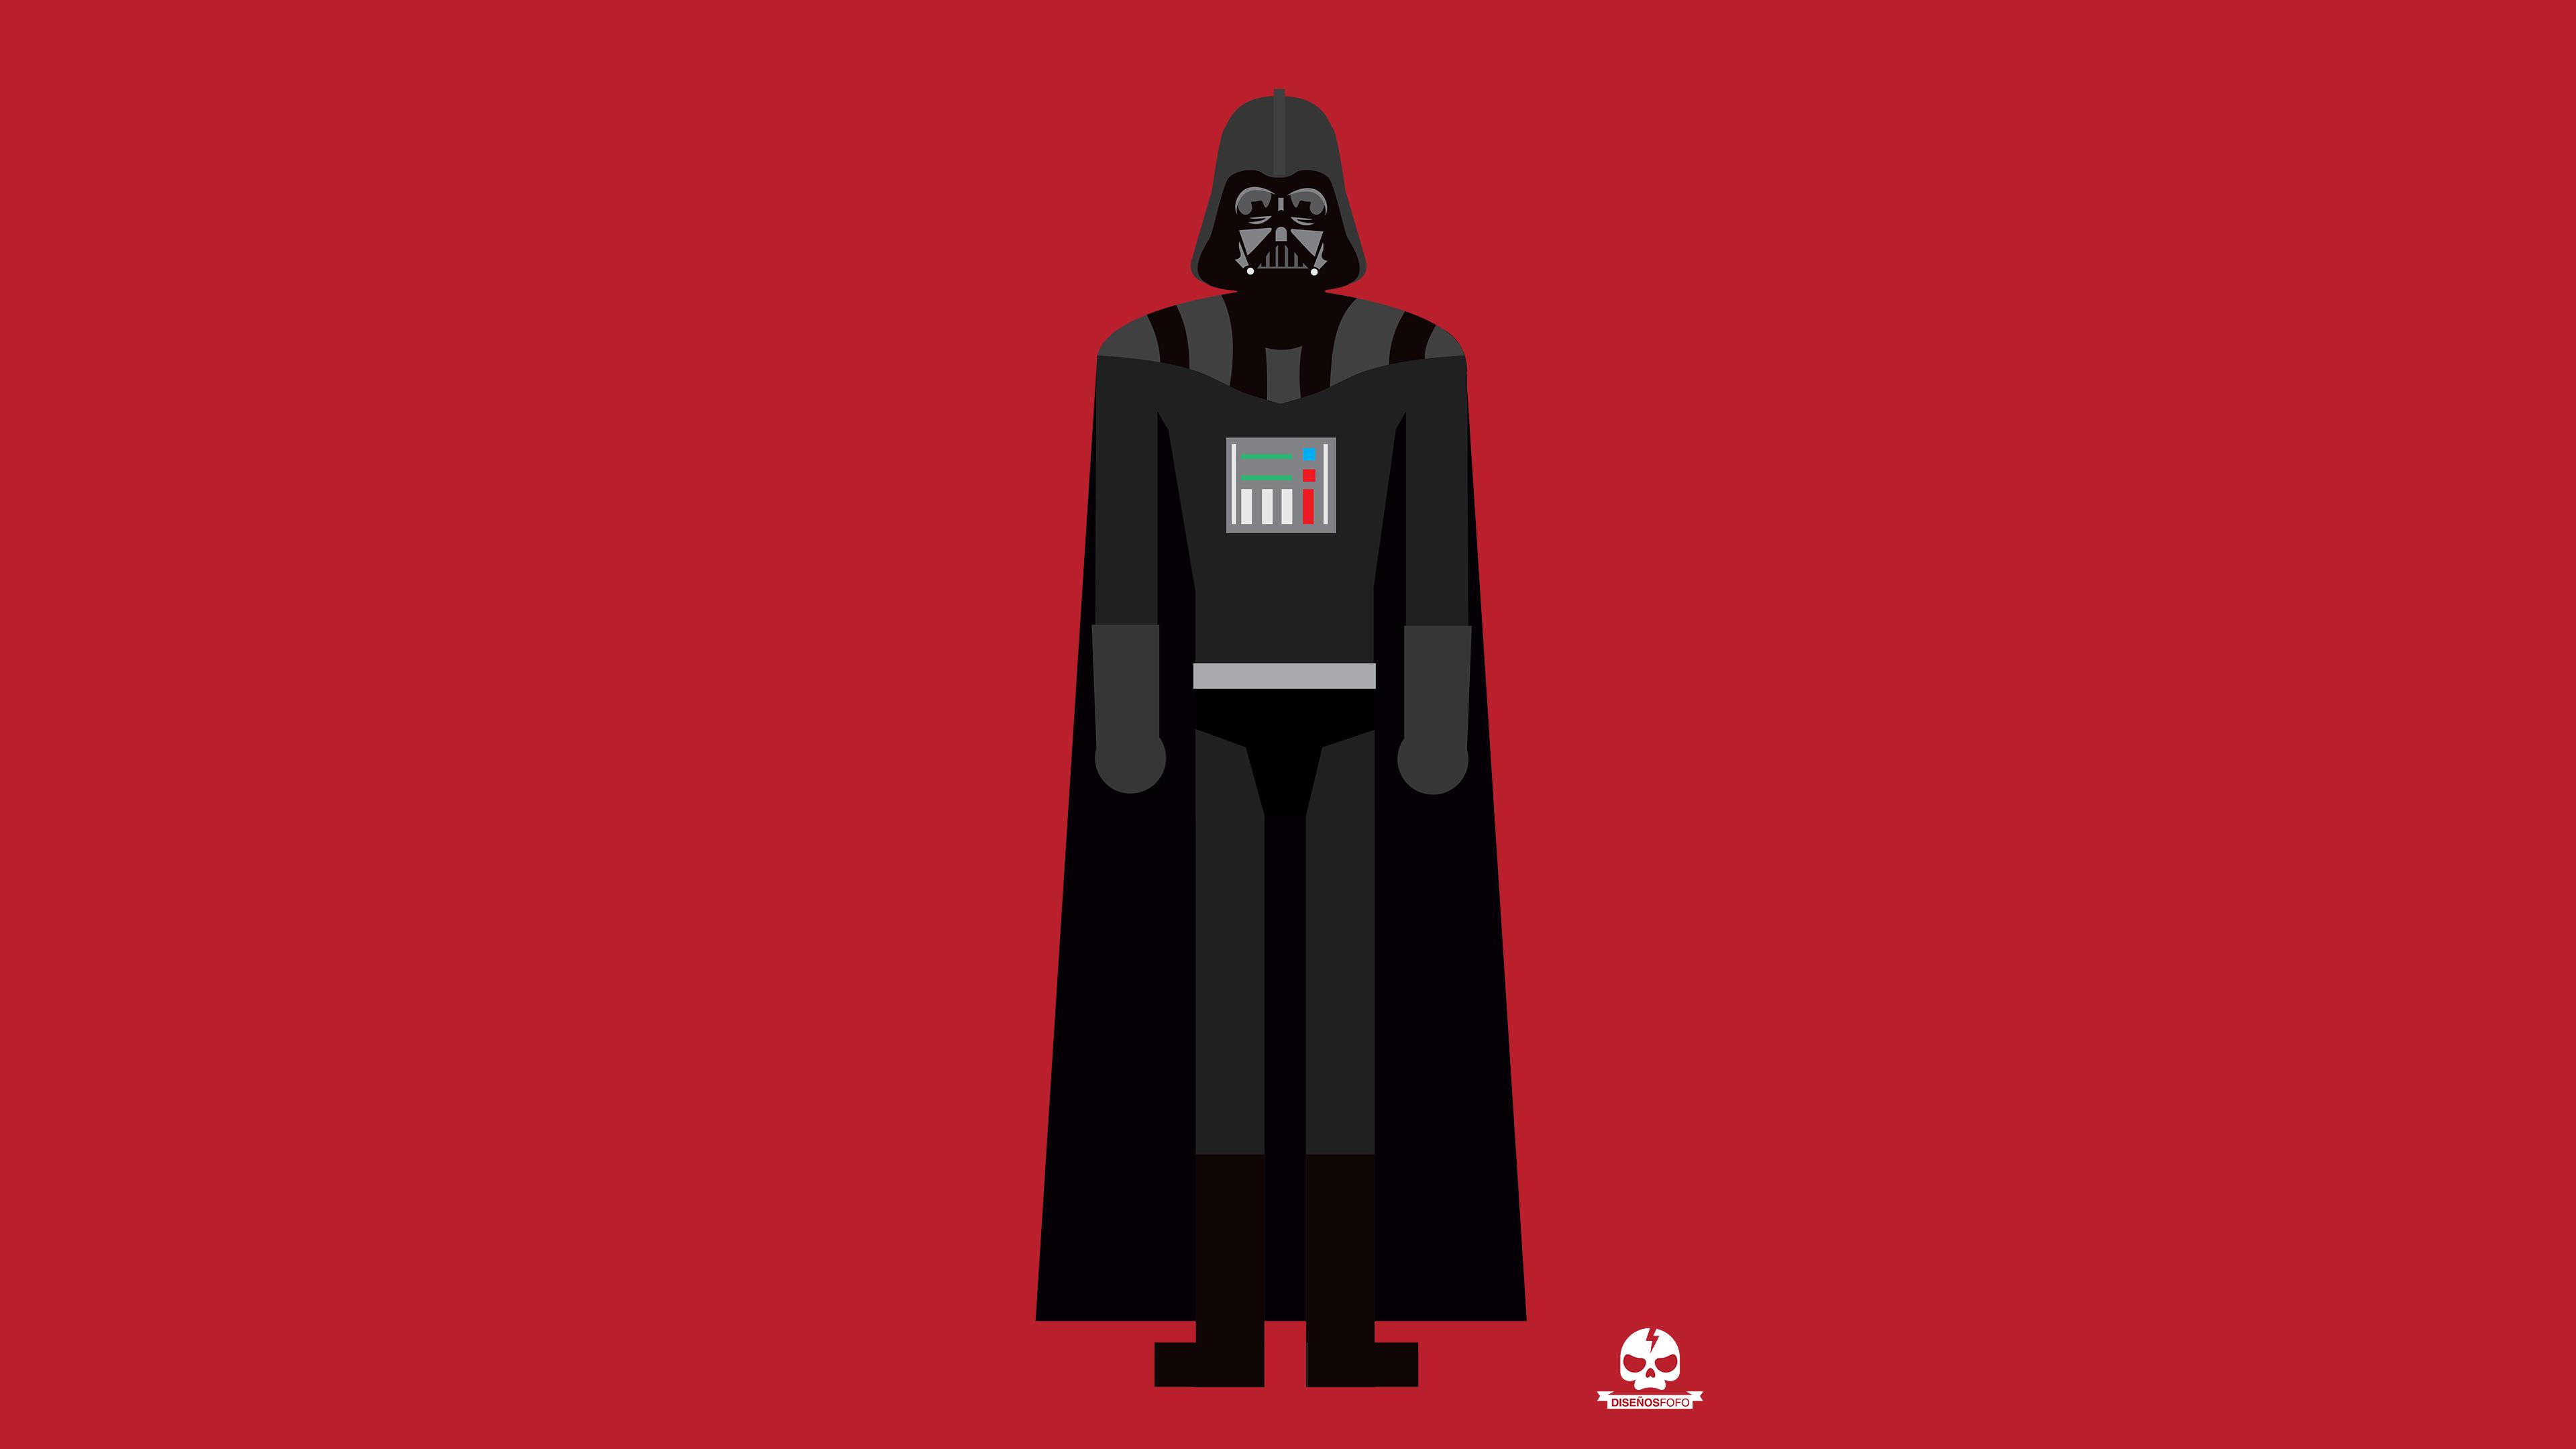 750x1334 Darth Vader 4k Minimalism Iphone 6 Iphone 6s